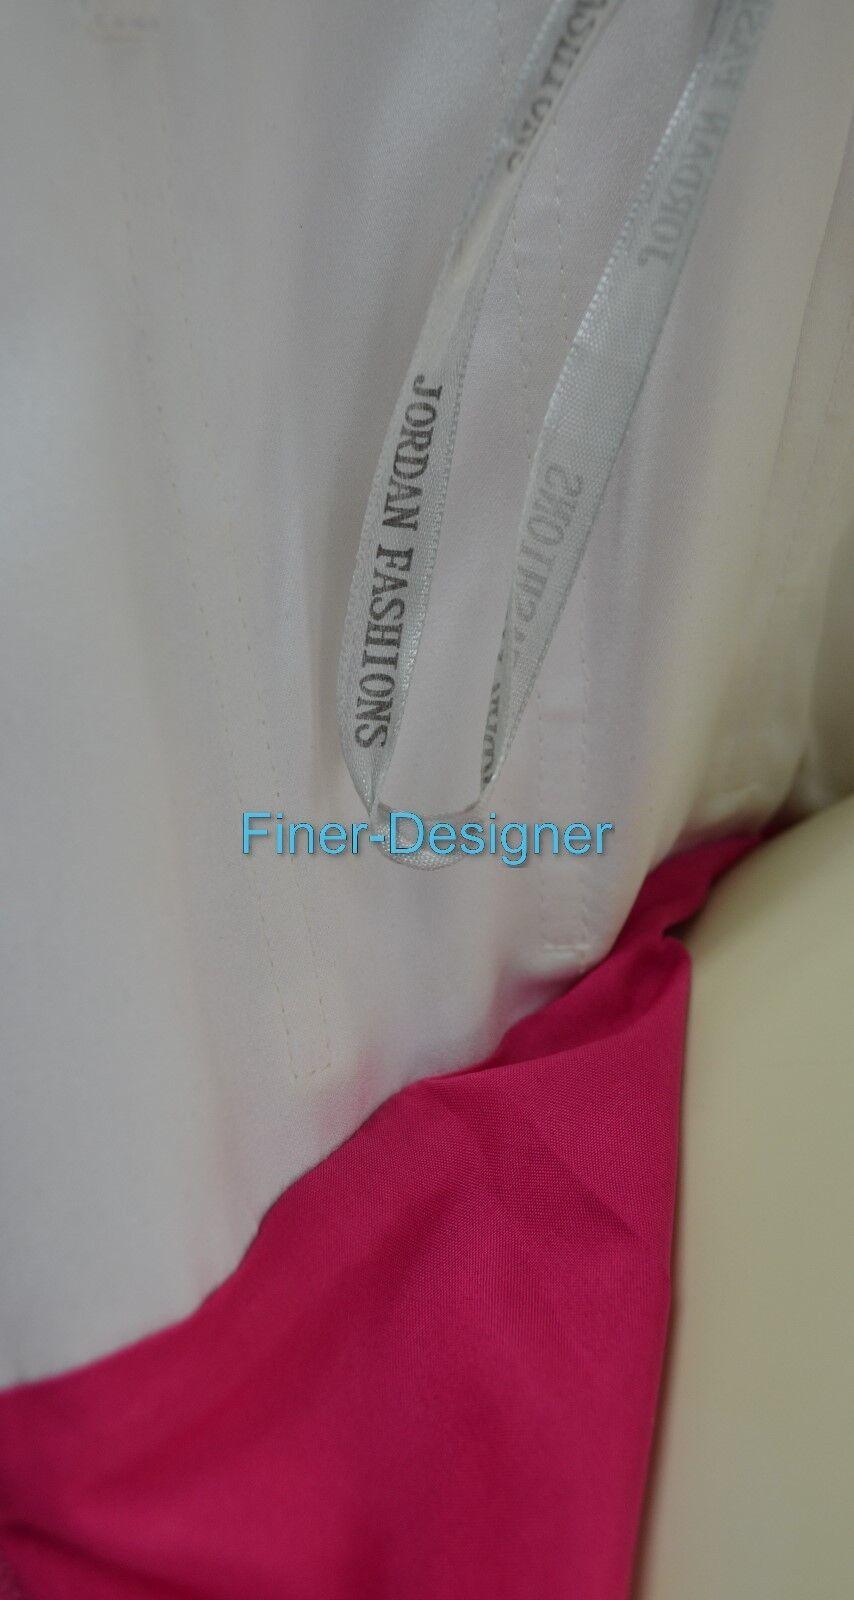 Jordan wedding Dress formal gown hot pink white bow strapless strapless strapless 4 6 S VTG 80s NEW 402e40